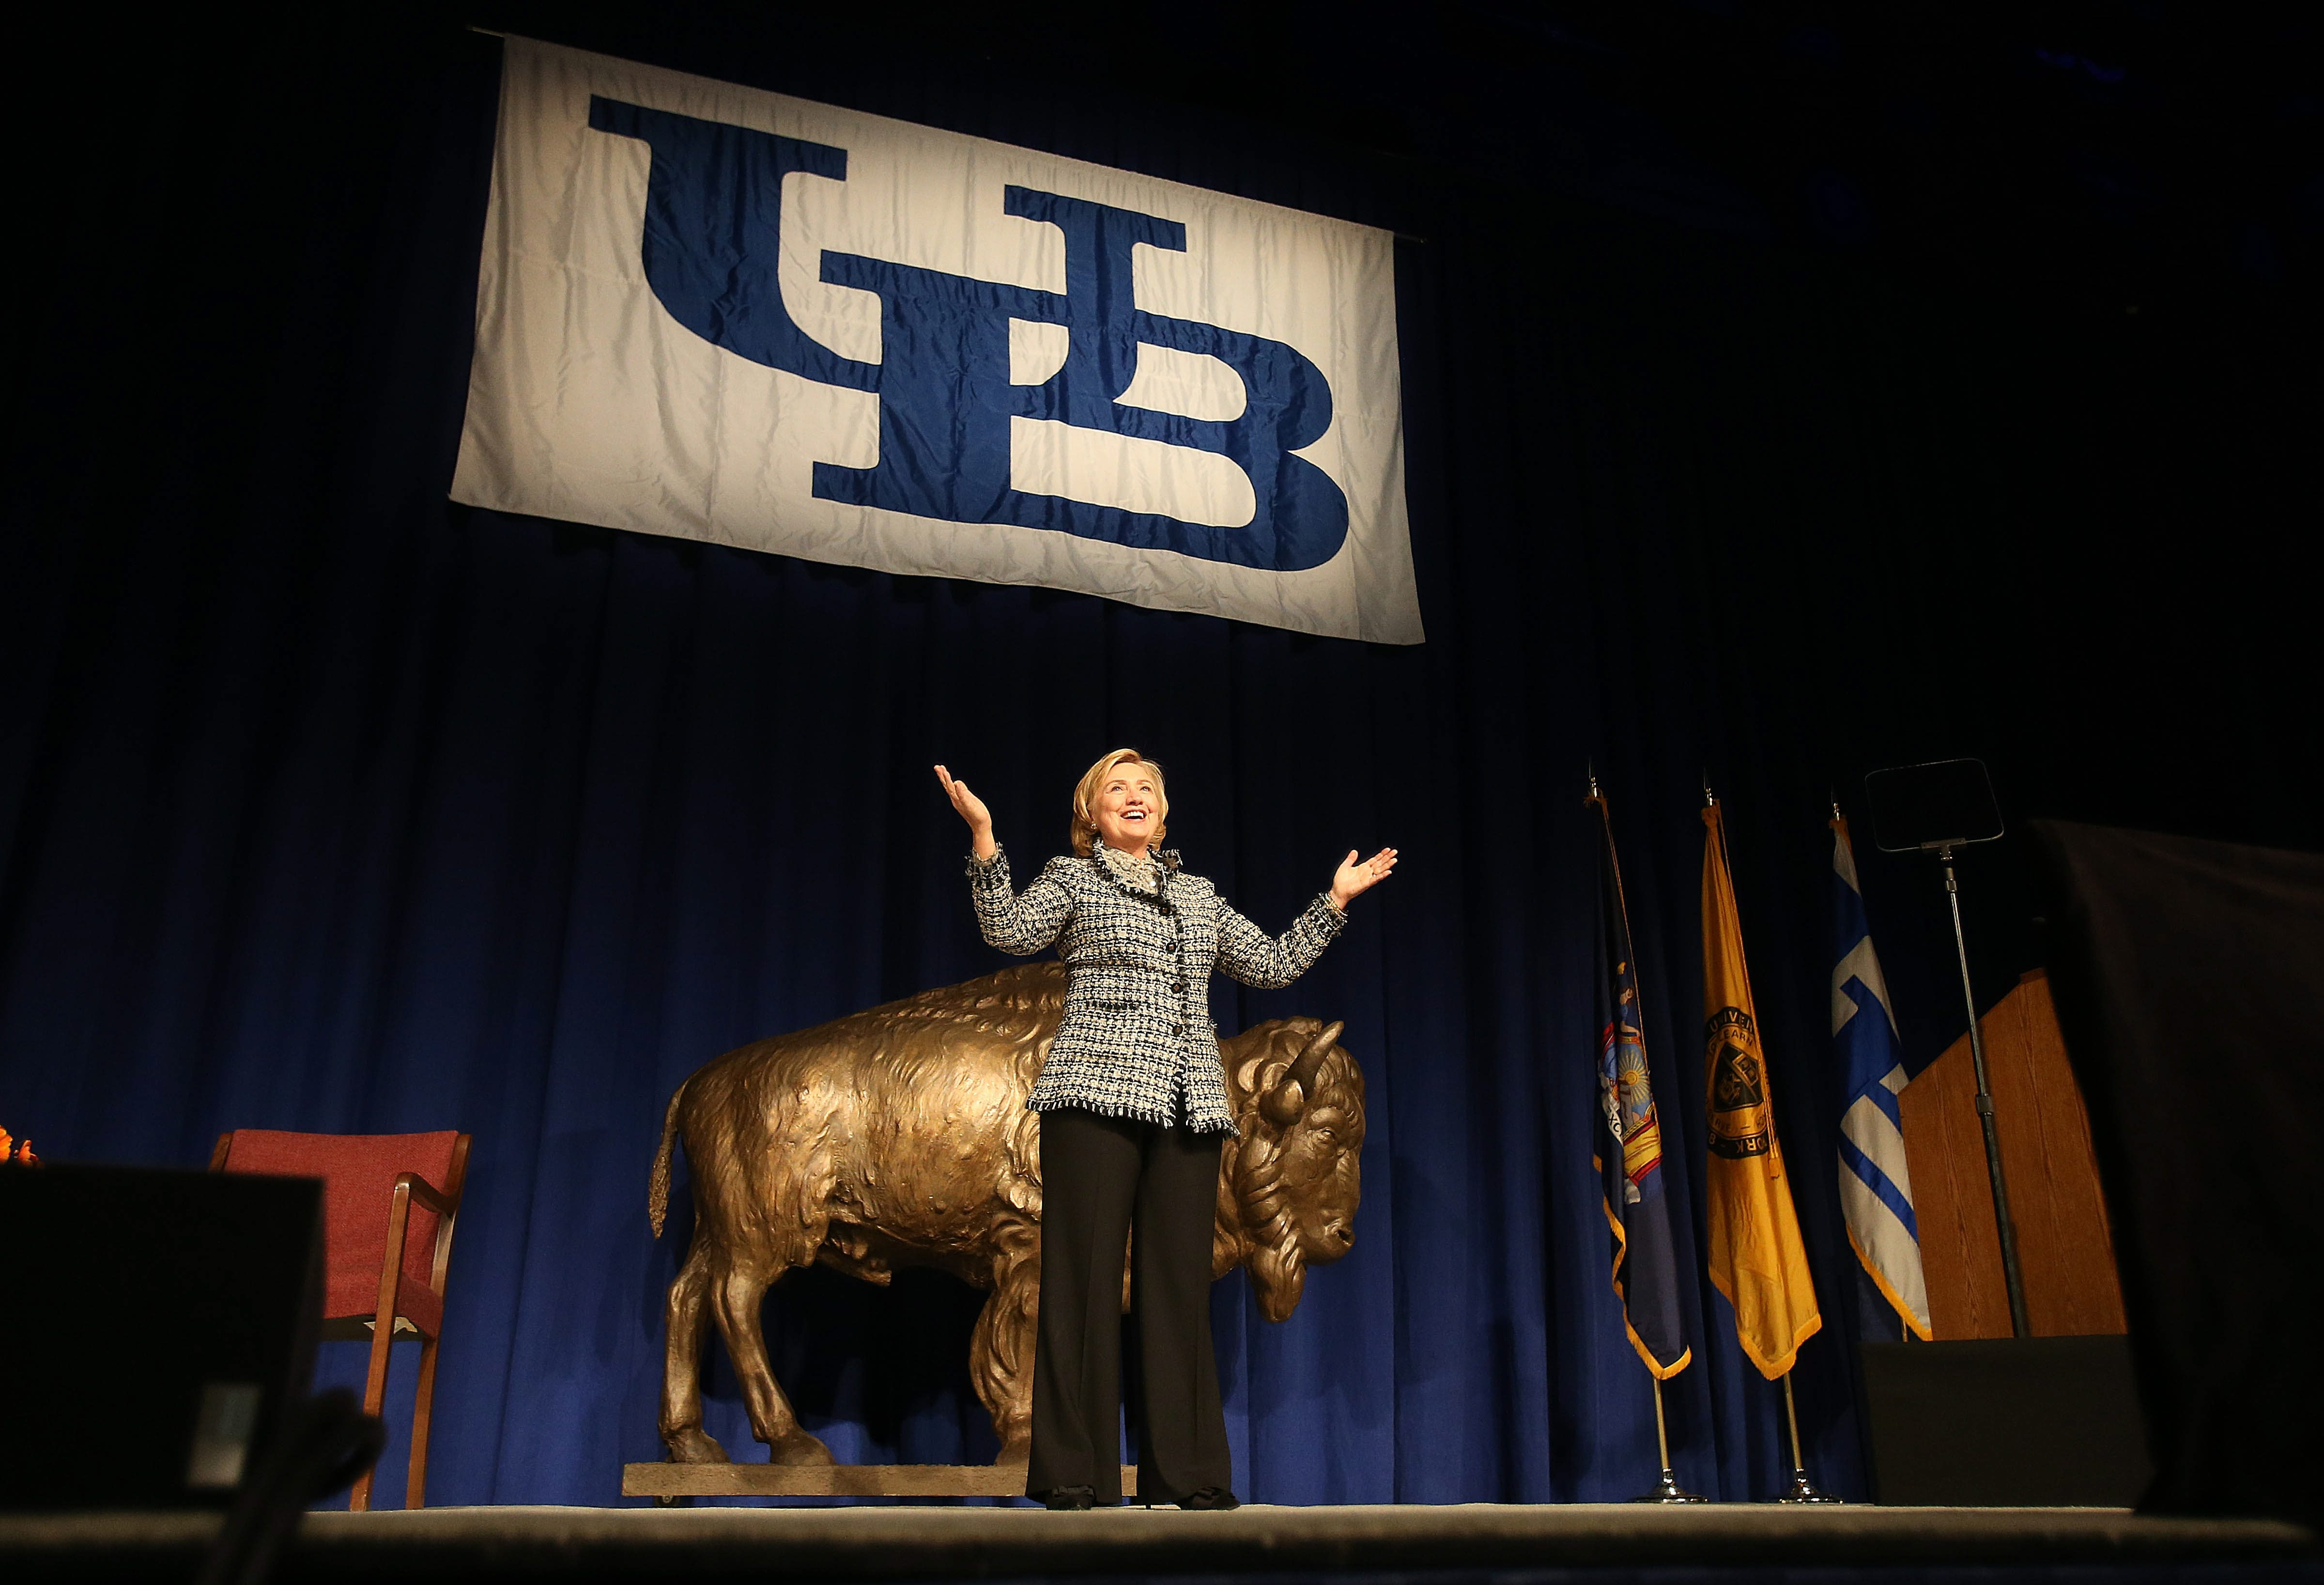 Hillary Clinton spoke at UB on Oct. 23, 2013.